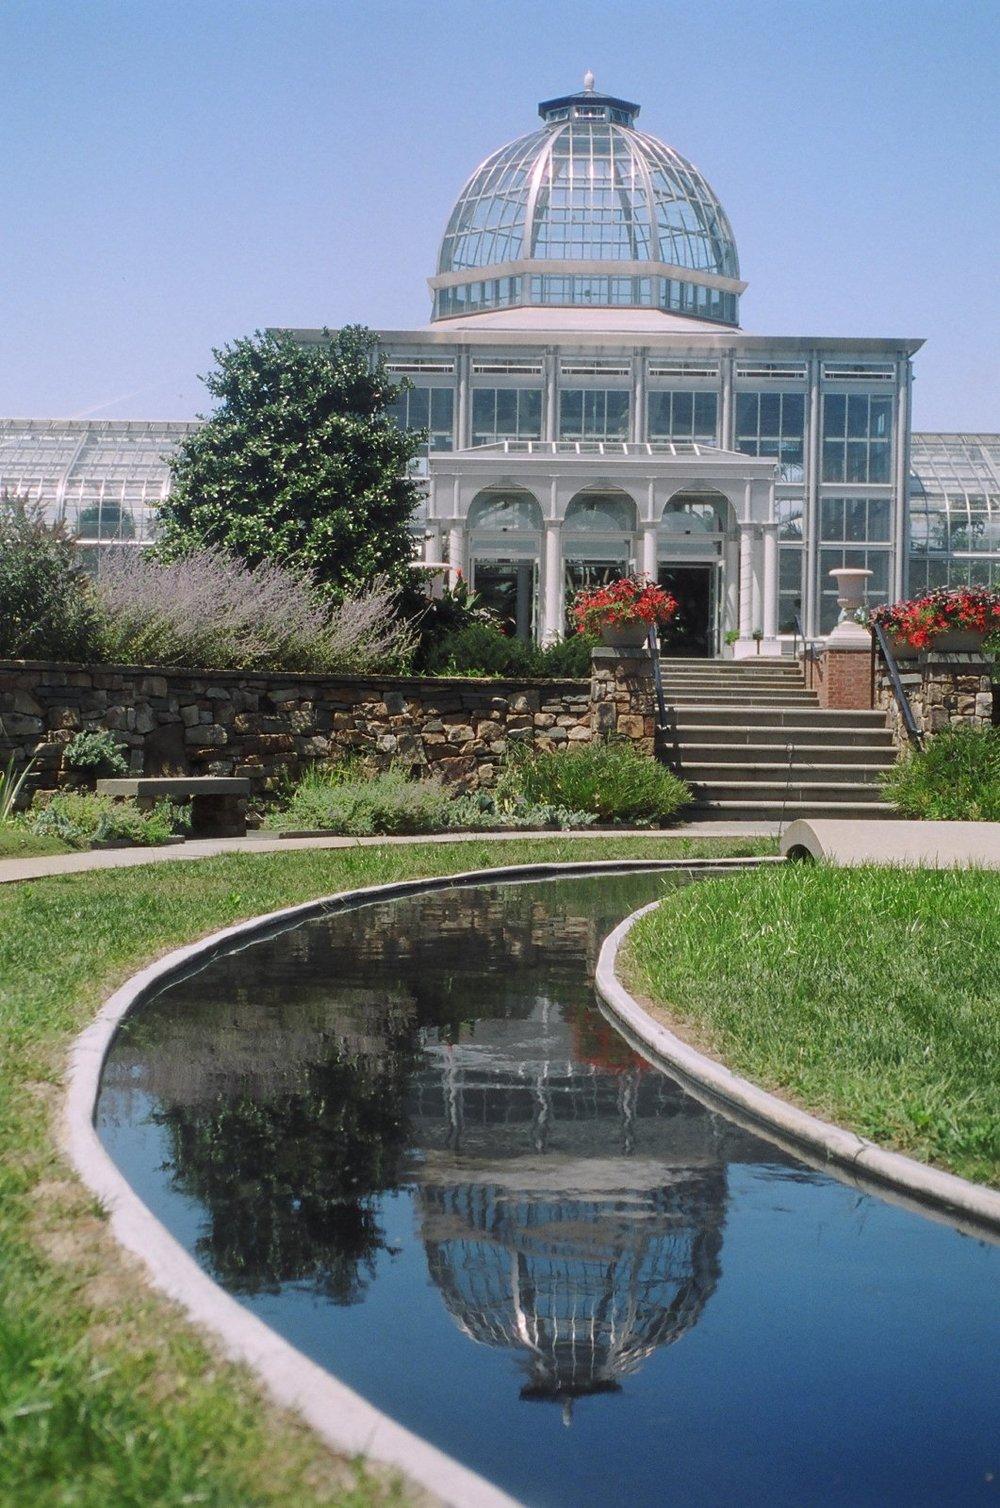 Conservatory, Lewis Ginter Botanical Garden